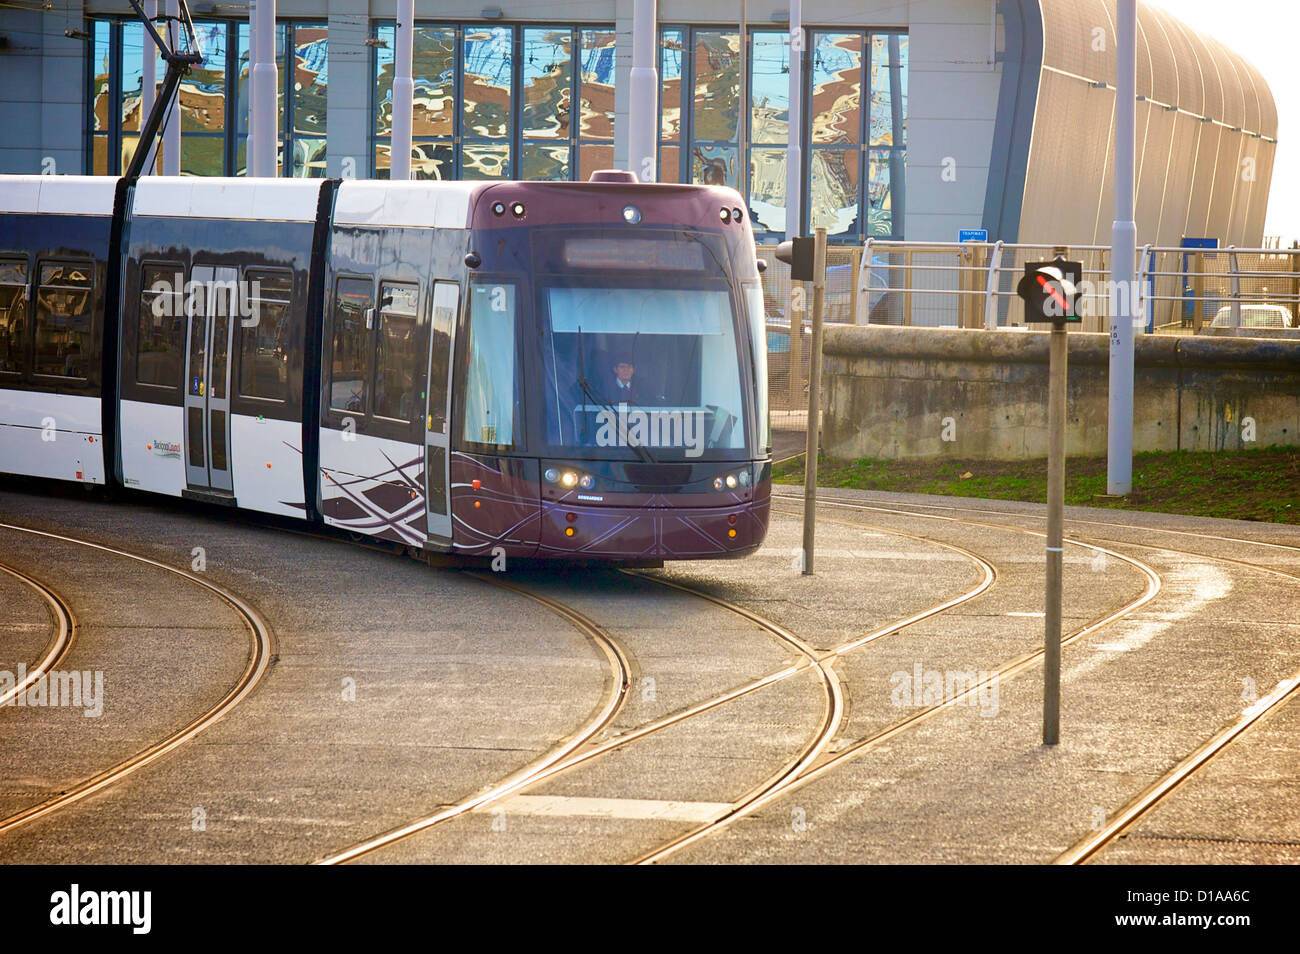 Bombardier tram leaving the new tram depot in Blackpool,Lancashire,UK - Stock Image